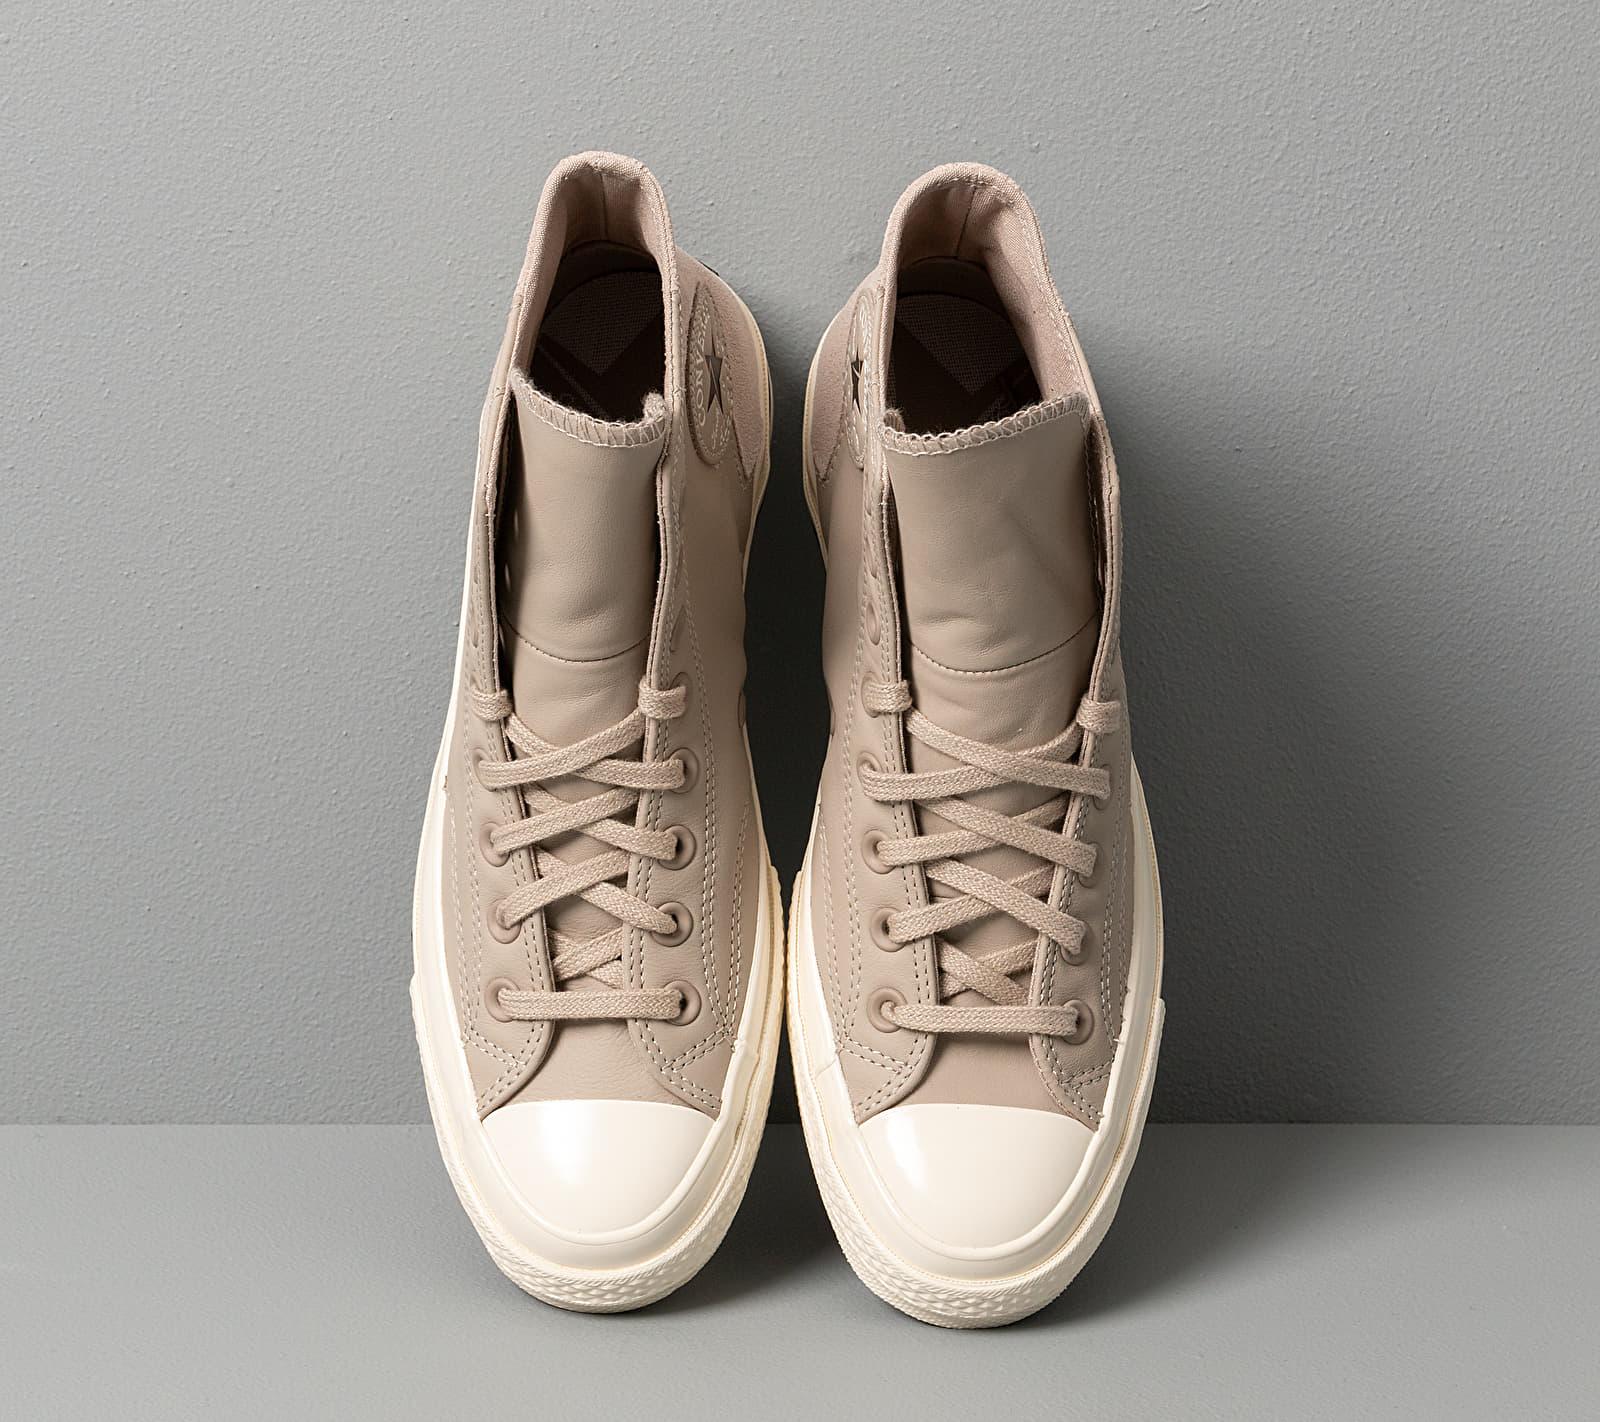 Converse Chuck 70 Vltg Leather And Suede Papyrus/ Papyrus/ Egret, Brown